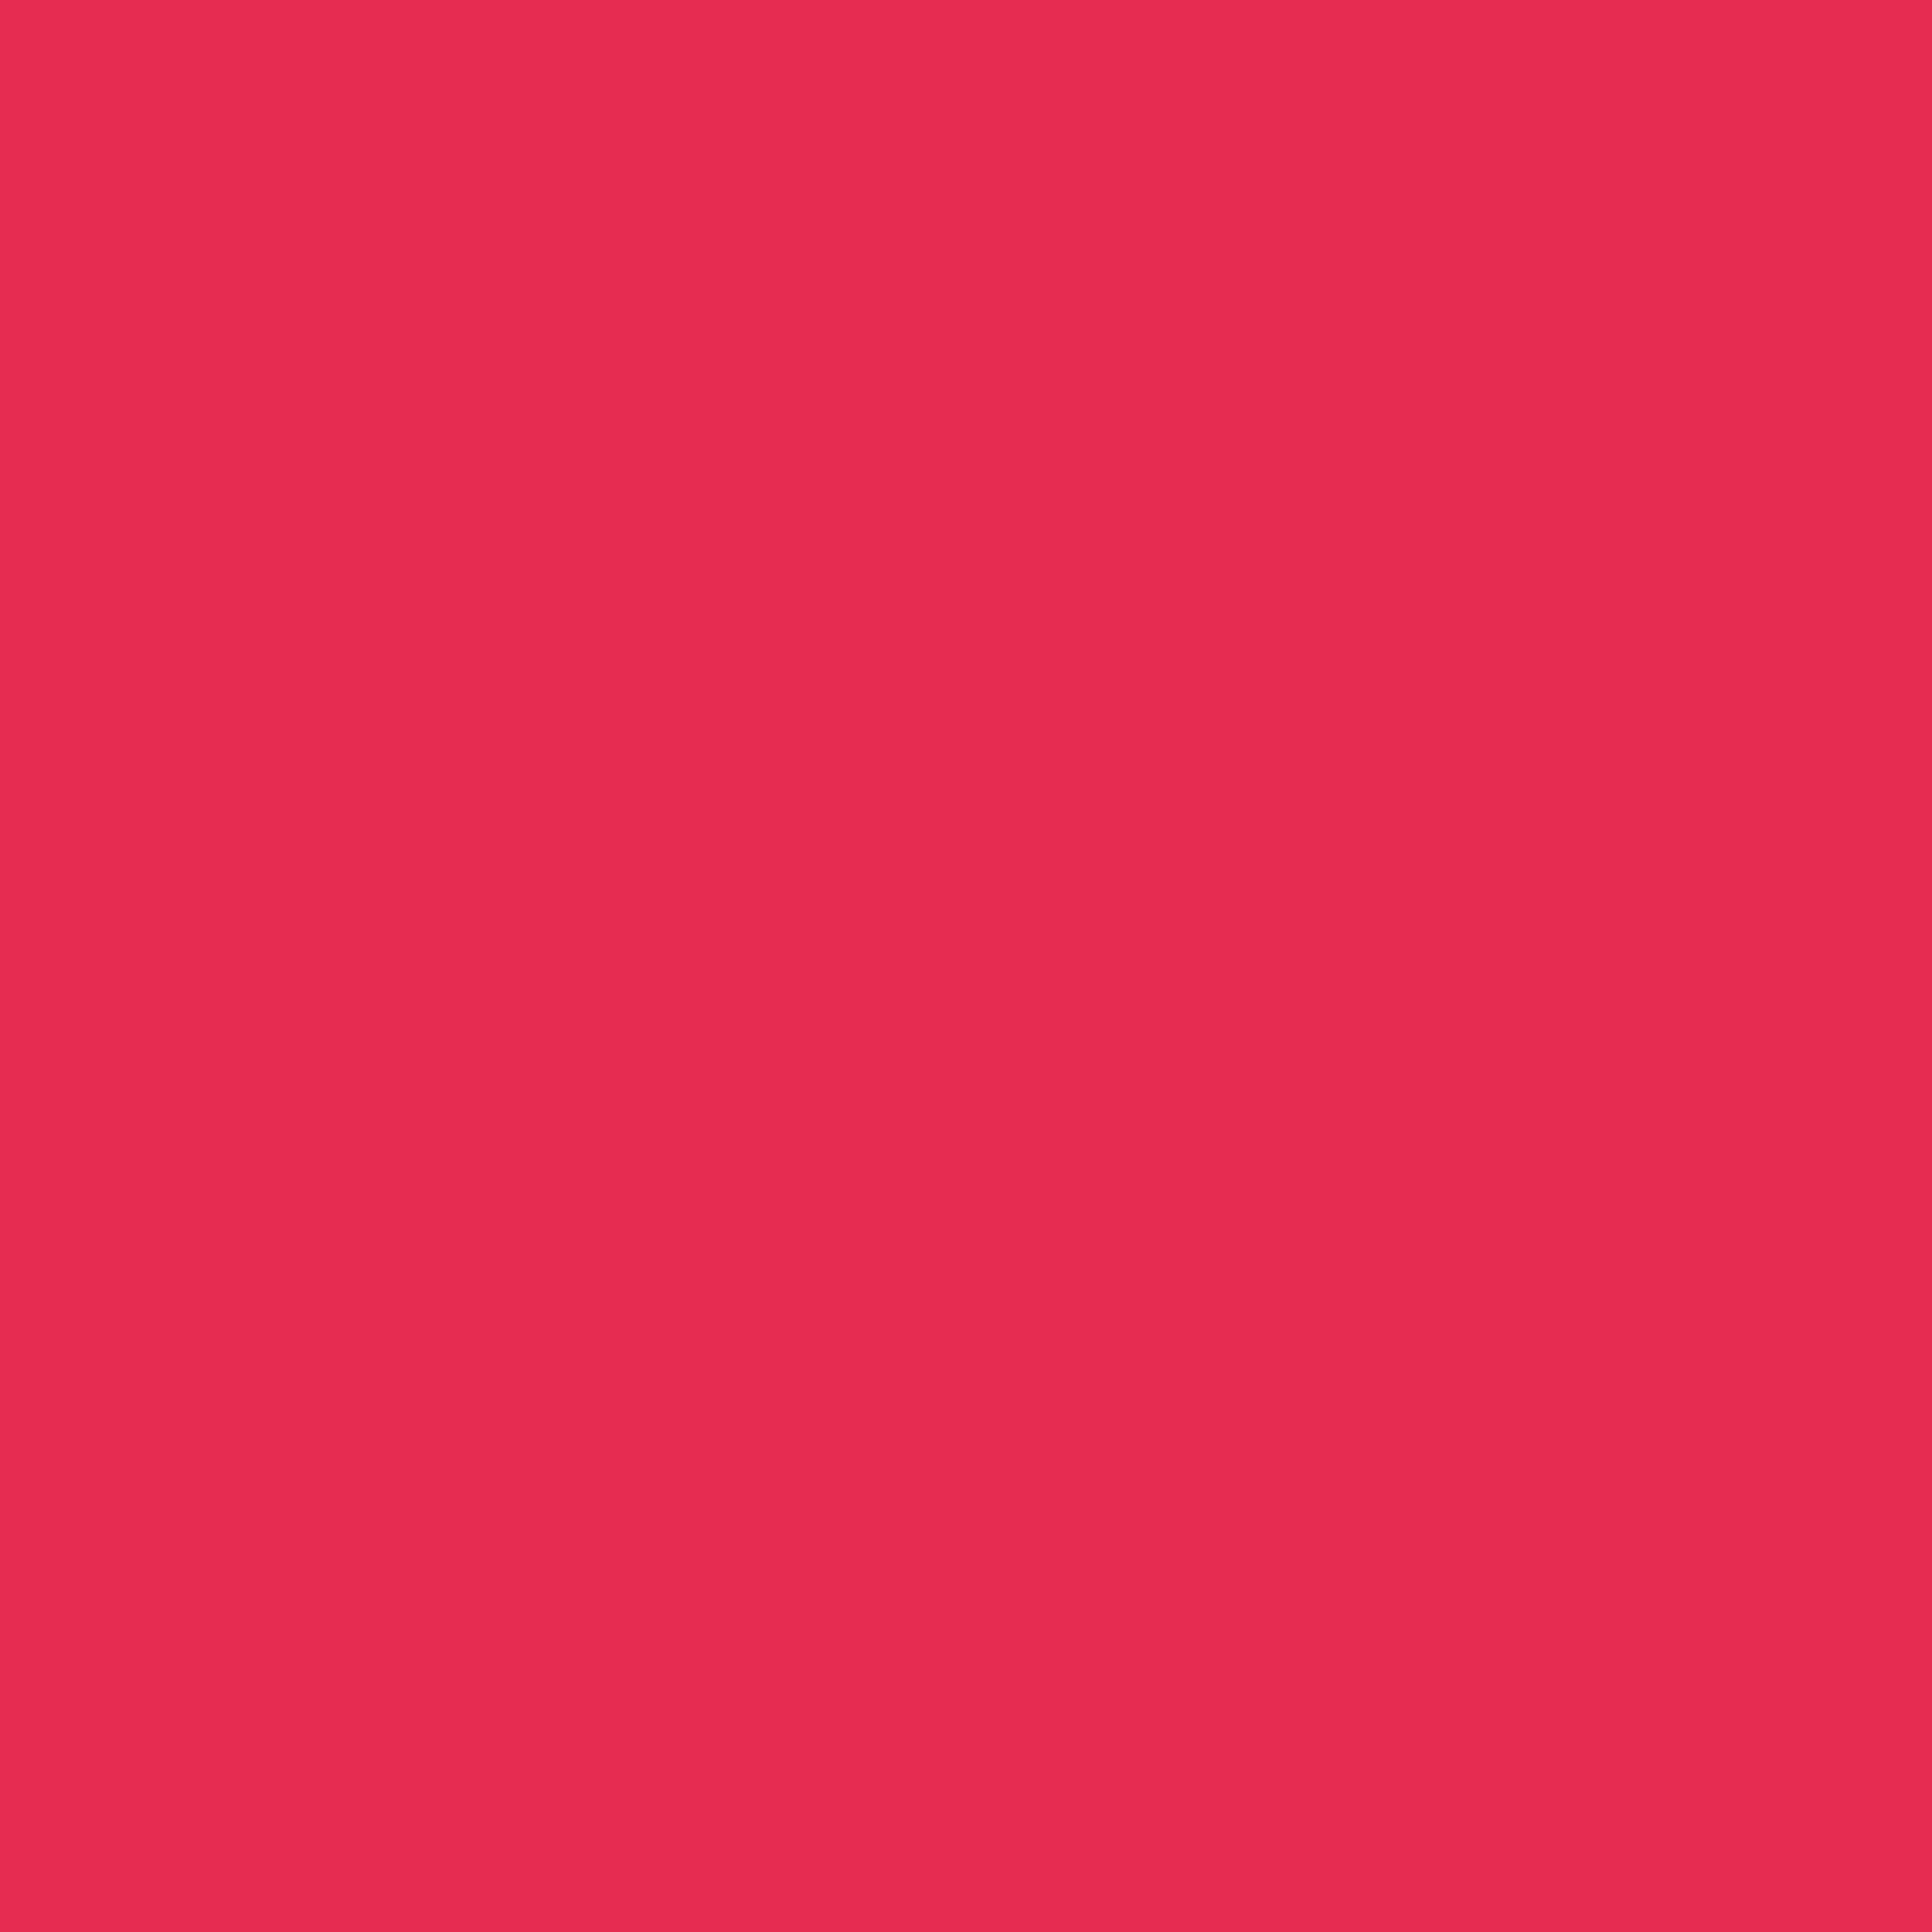 3600x3600 Amaranth Solid Color Background